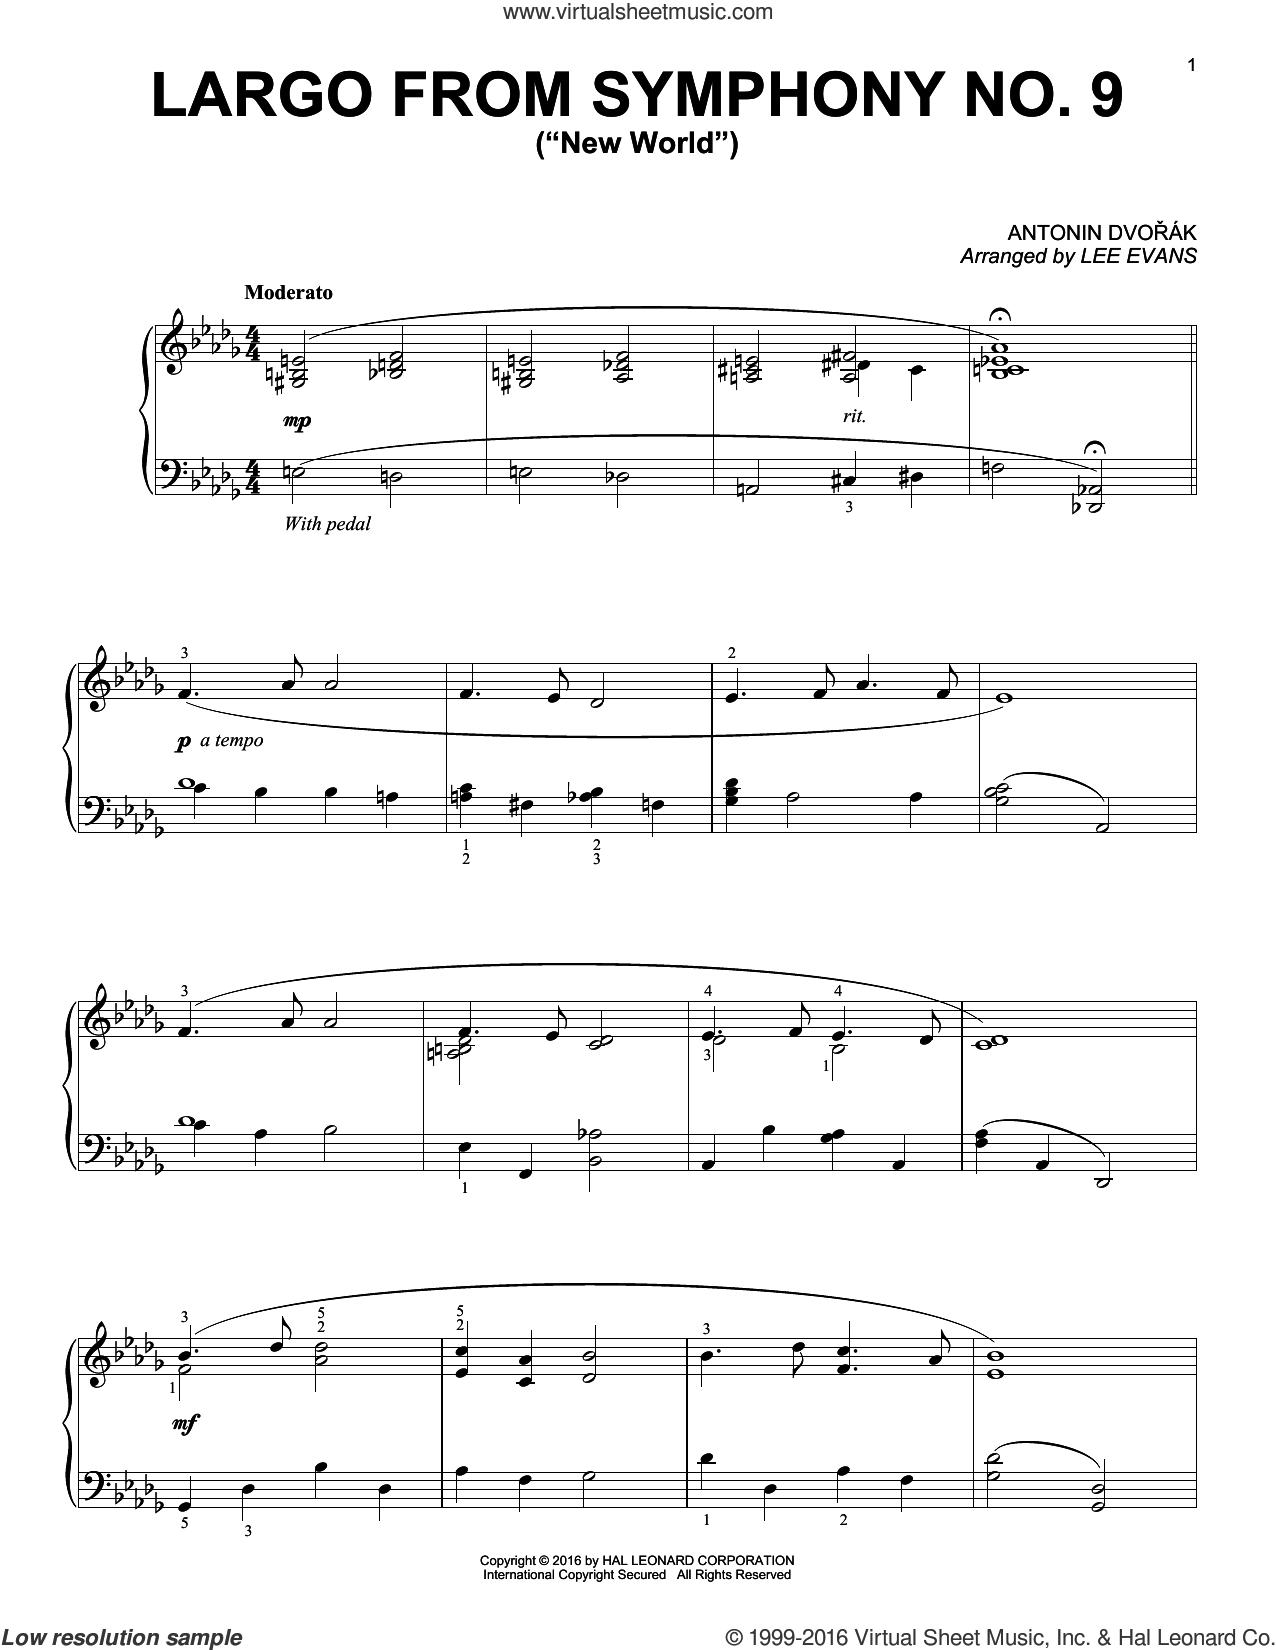 Largo From Symphony No. 9 ('New World'), (intermediate) sheet music for piano solo by Antonin Dvorak, Lee Evans and Antonin Dvorak, classical score, intermediate skill level